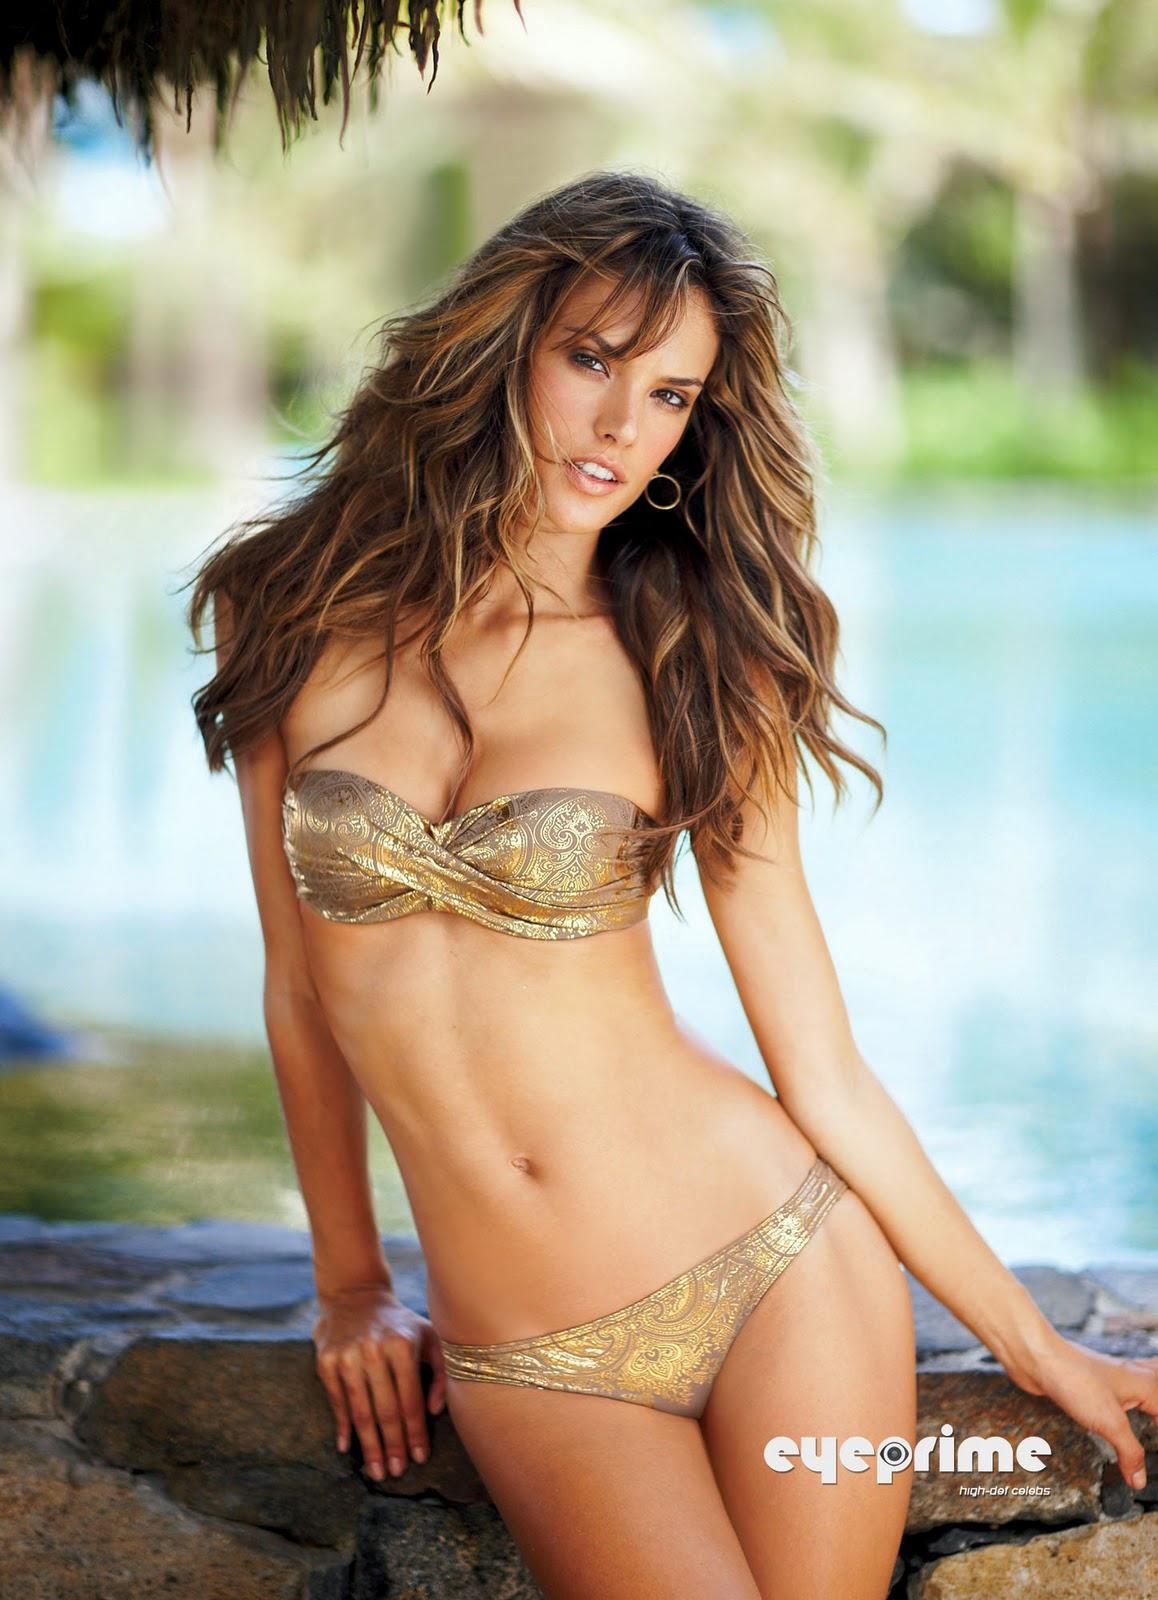 Victoria Secret Swimwear Catalogue 2010 Models